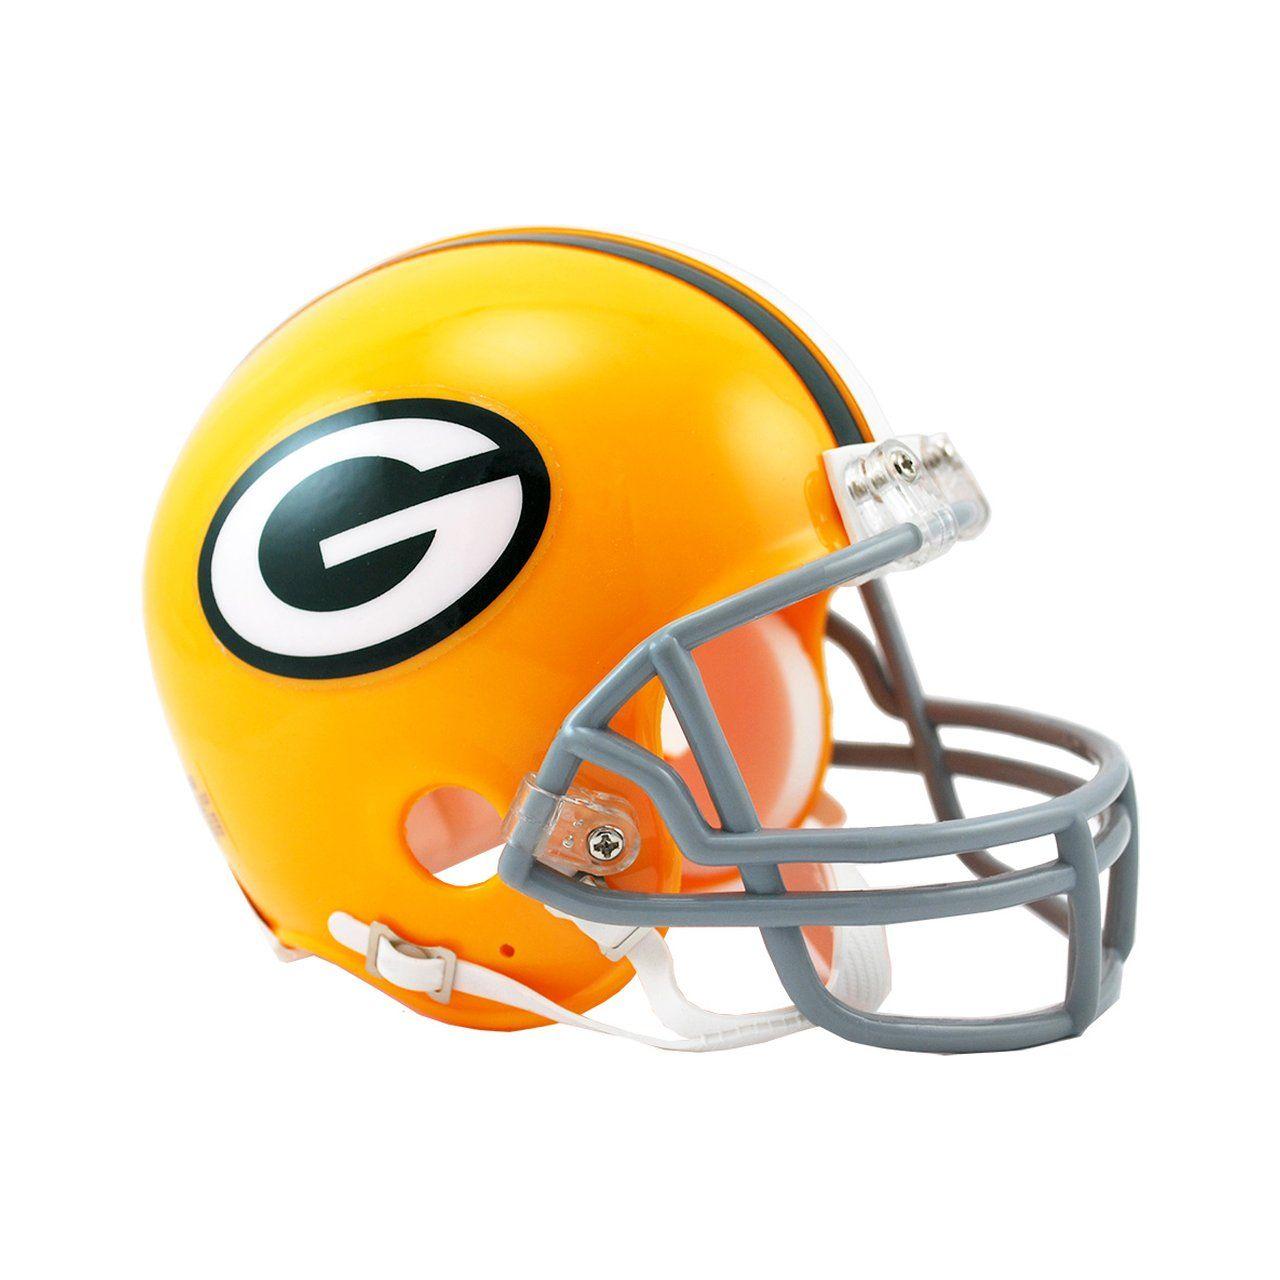 amfoo - Riddell VSR4 Mini Football Helm - Green Bay Packers 1961-79